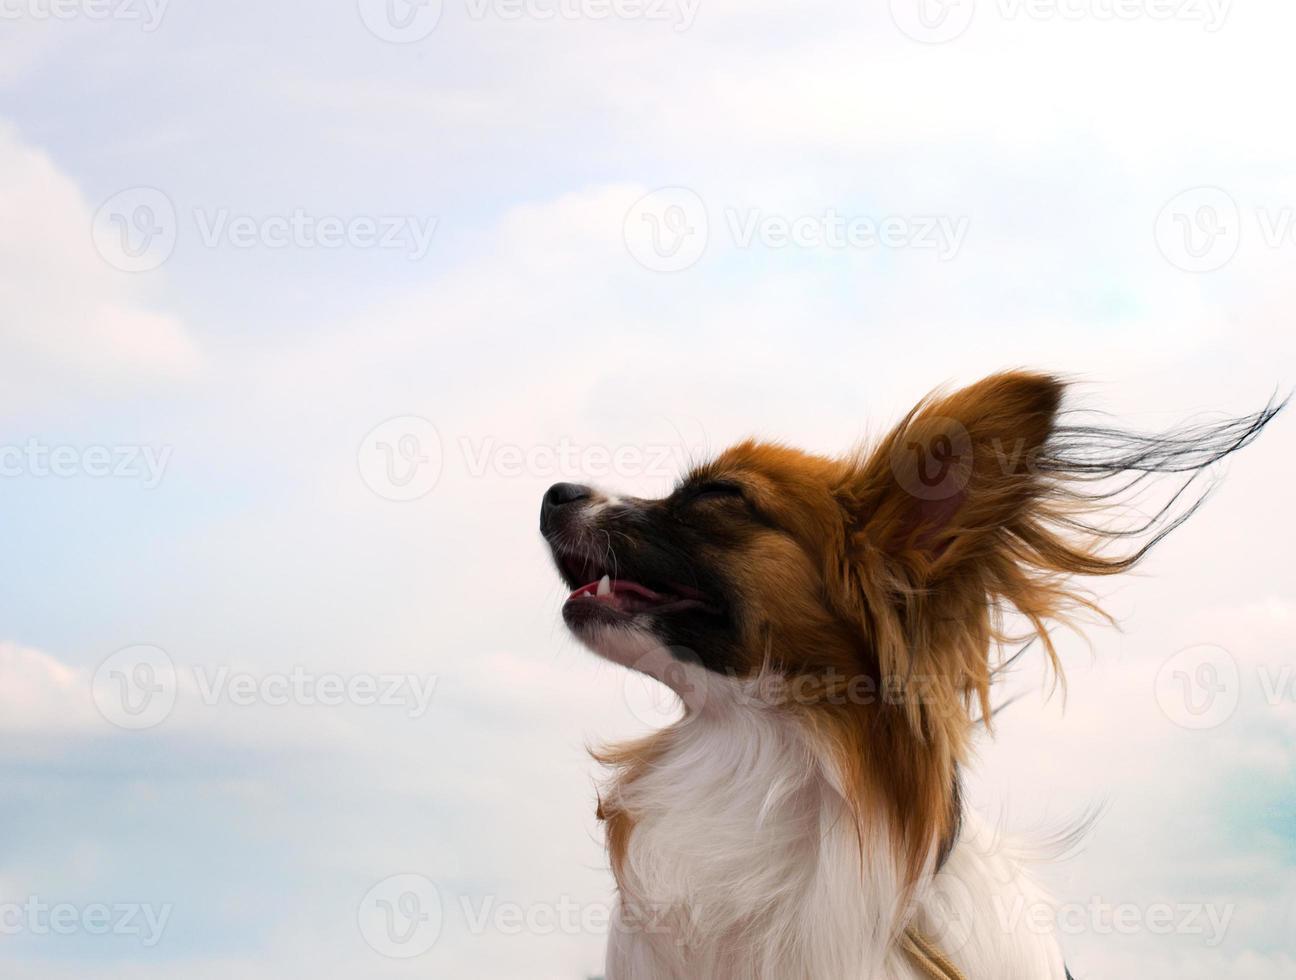 papillonhund foto